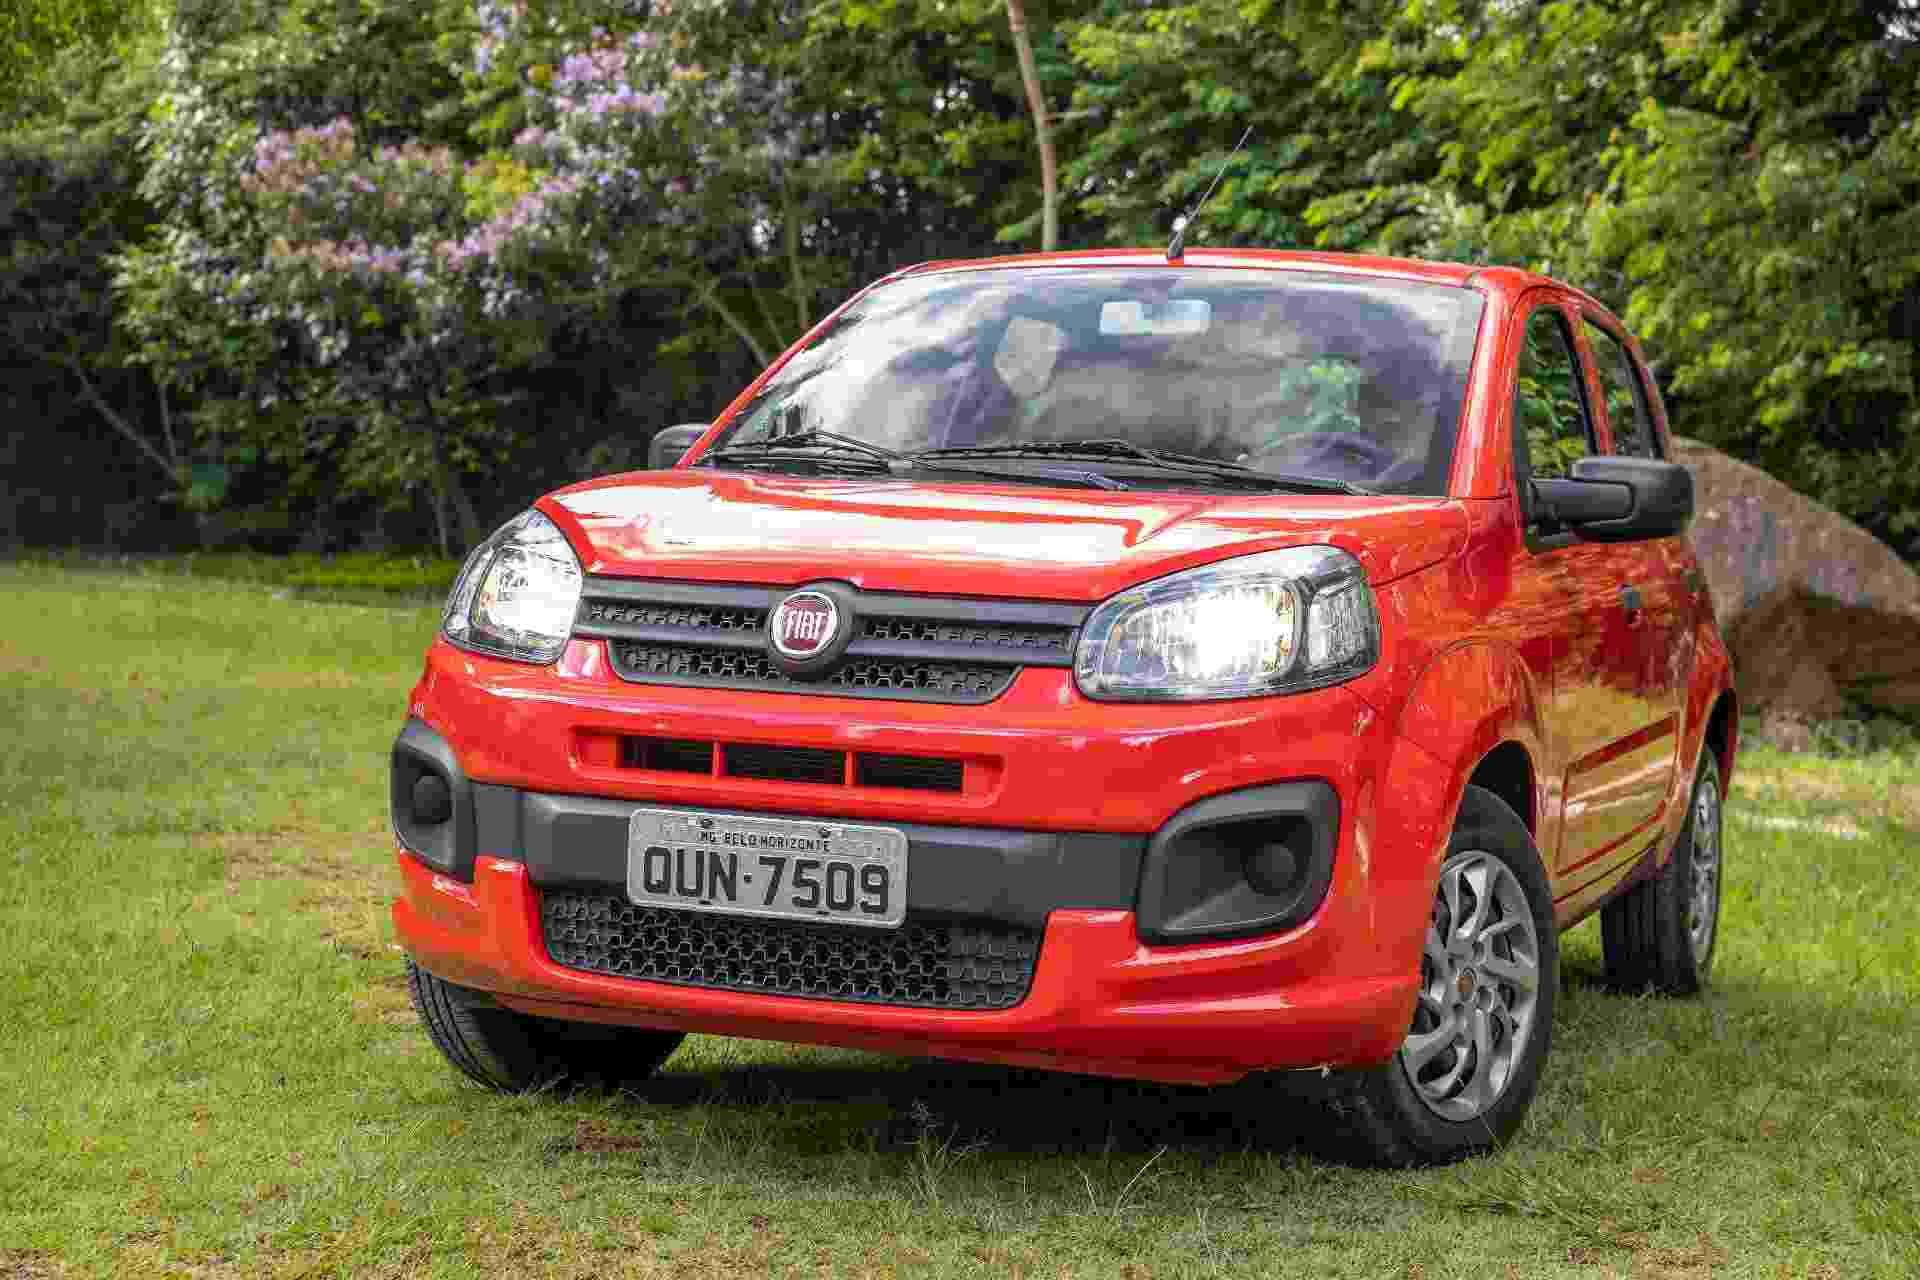 Fiat Uno Attractive 1.0 Fire Evo - Marcos Camargo/UOL